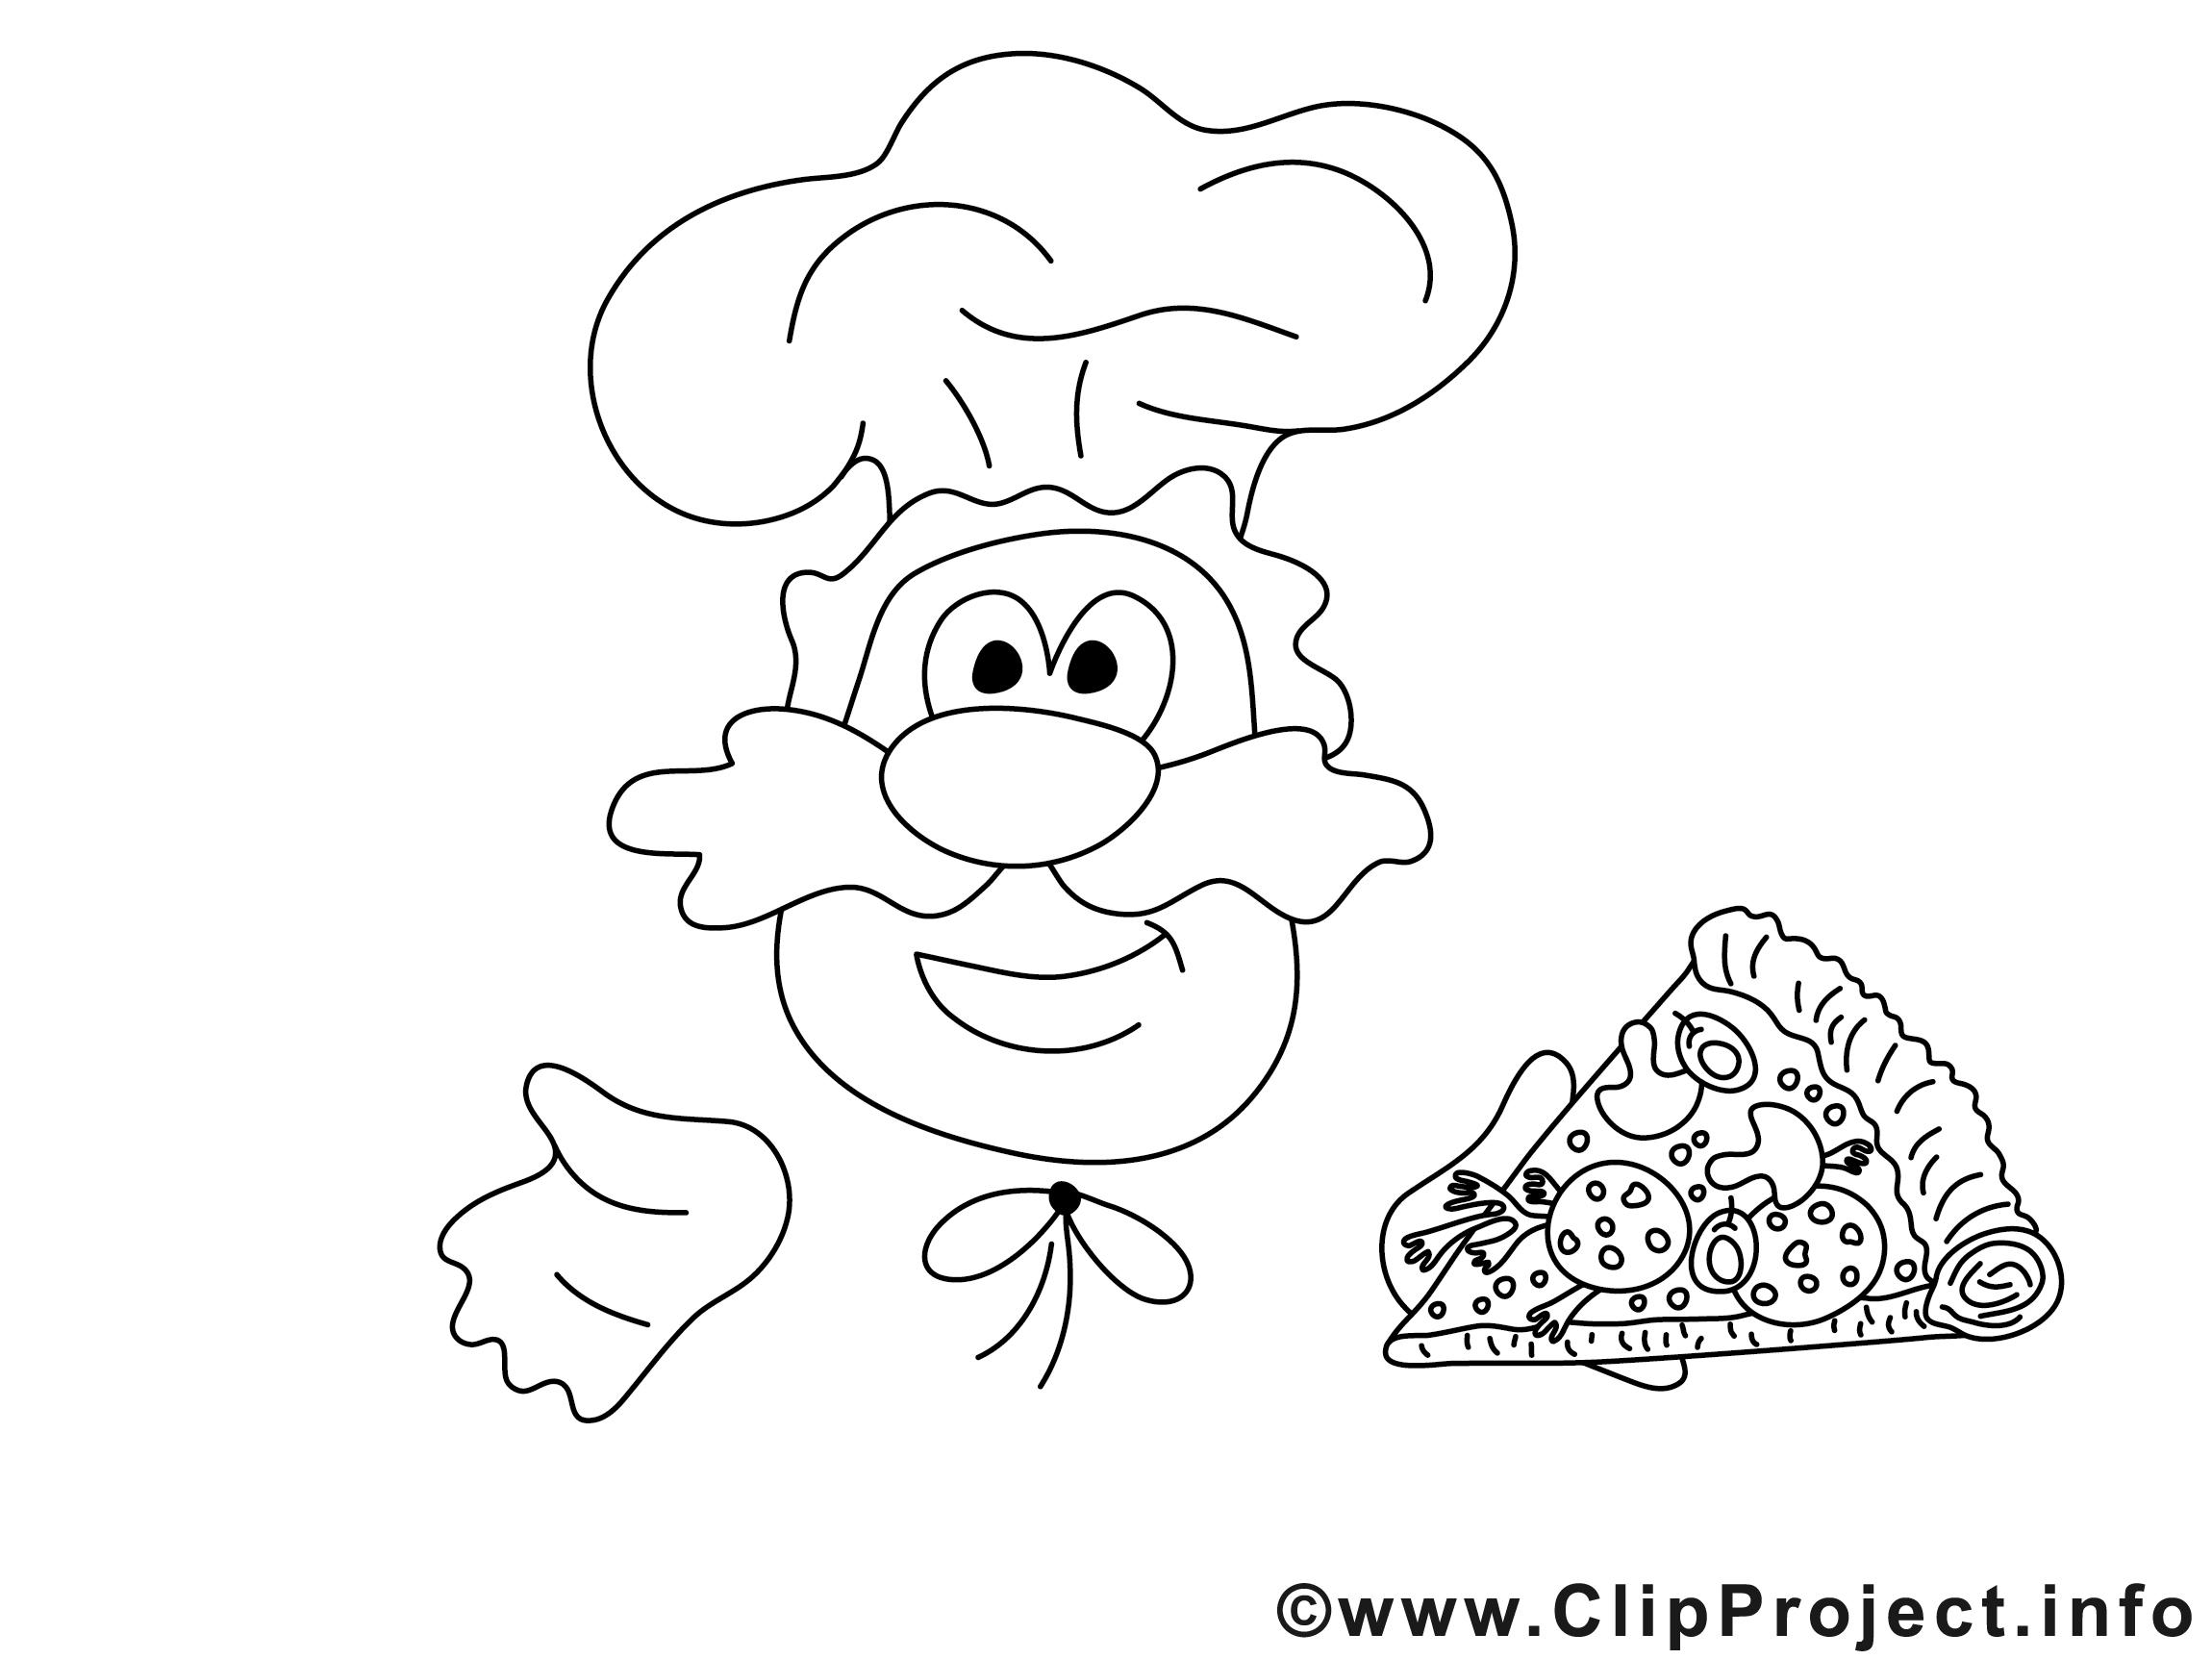 Restaurant dessin cuisine gratuits imprimer repas - Clipart cuisine gratuit ...